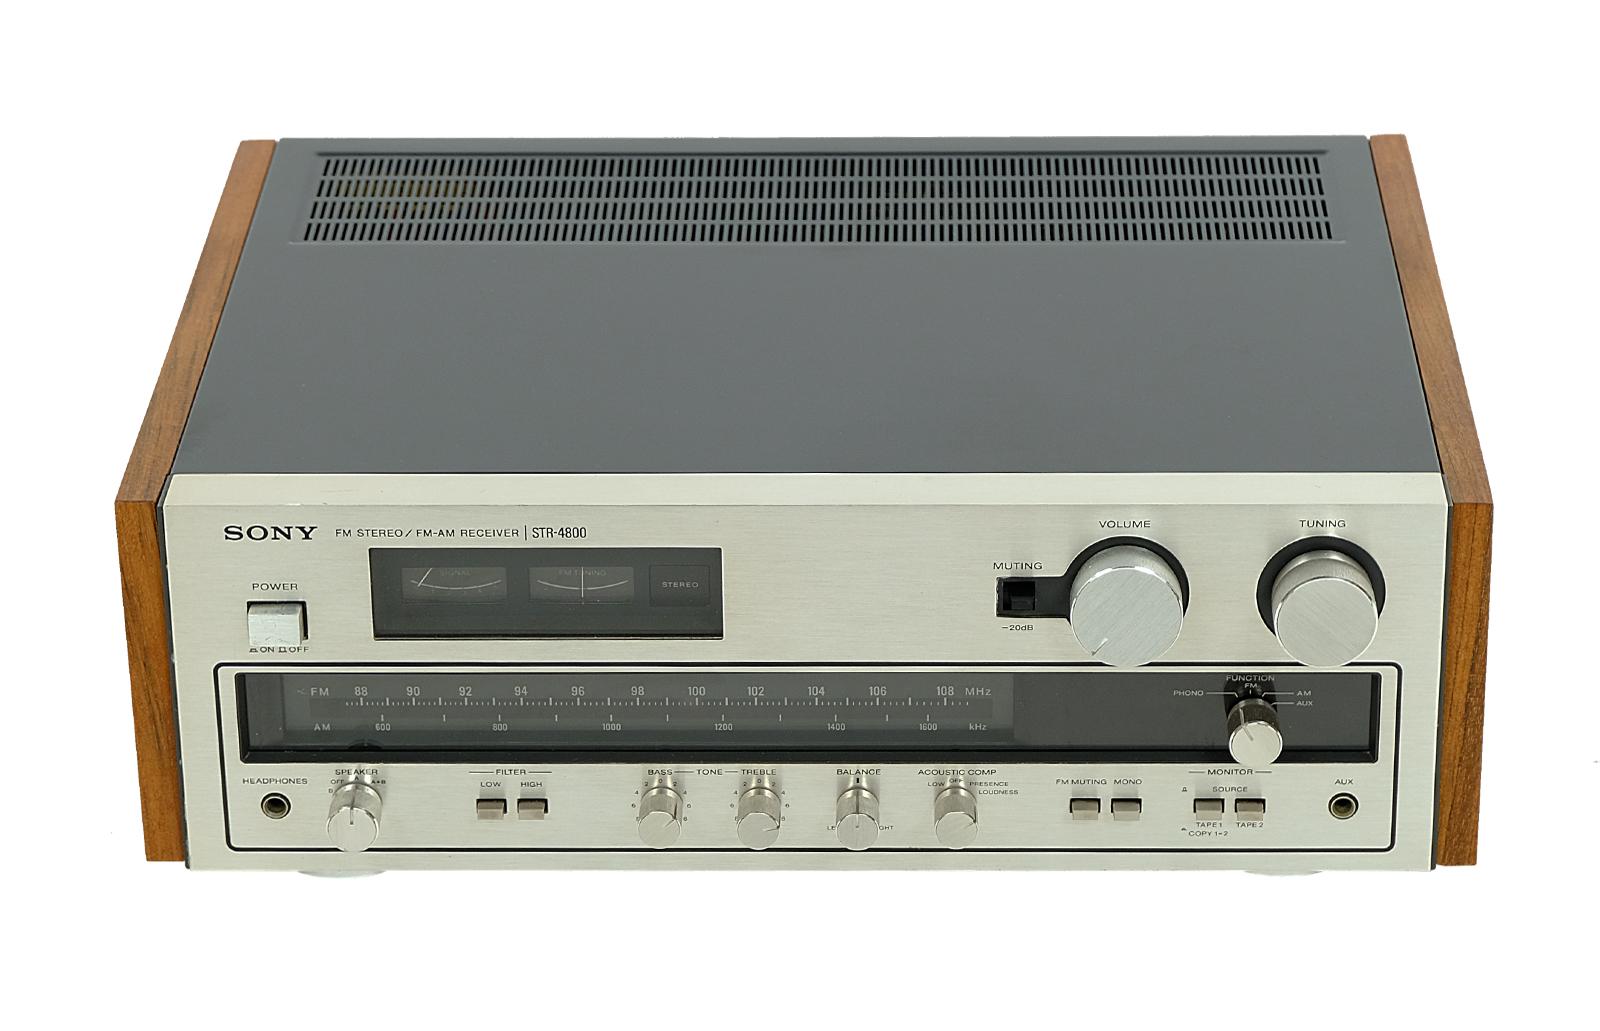 Sony STR 4800